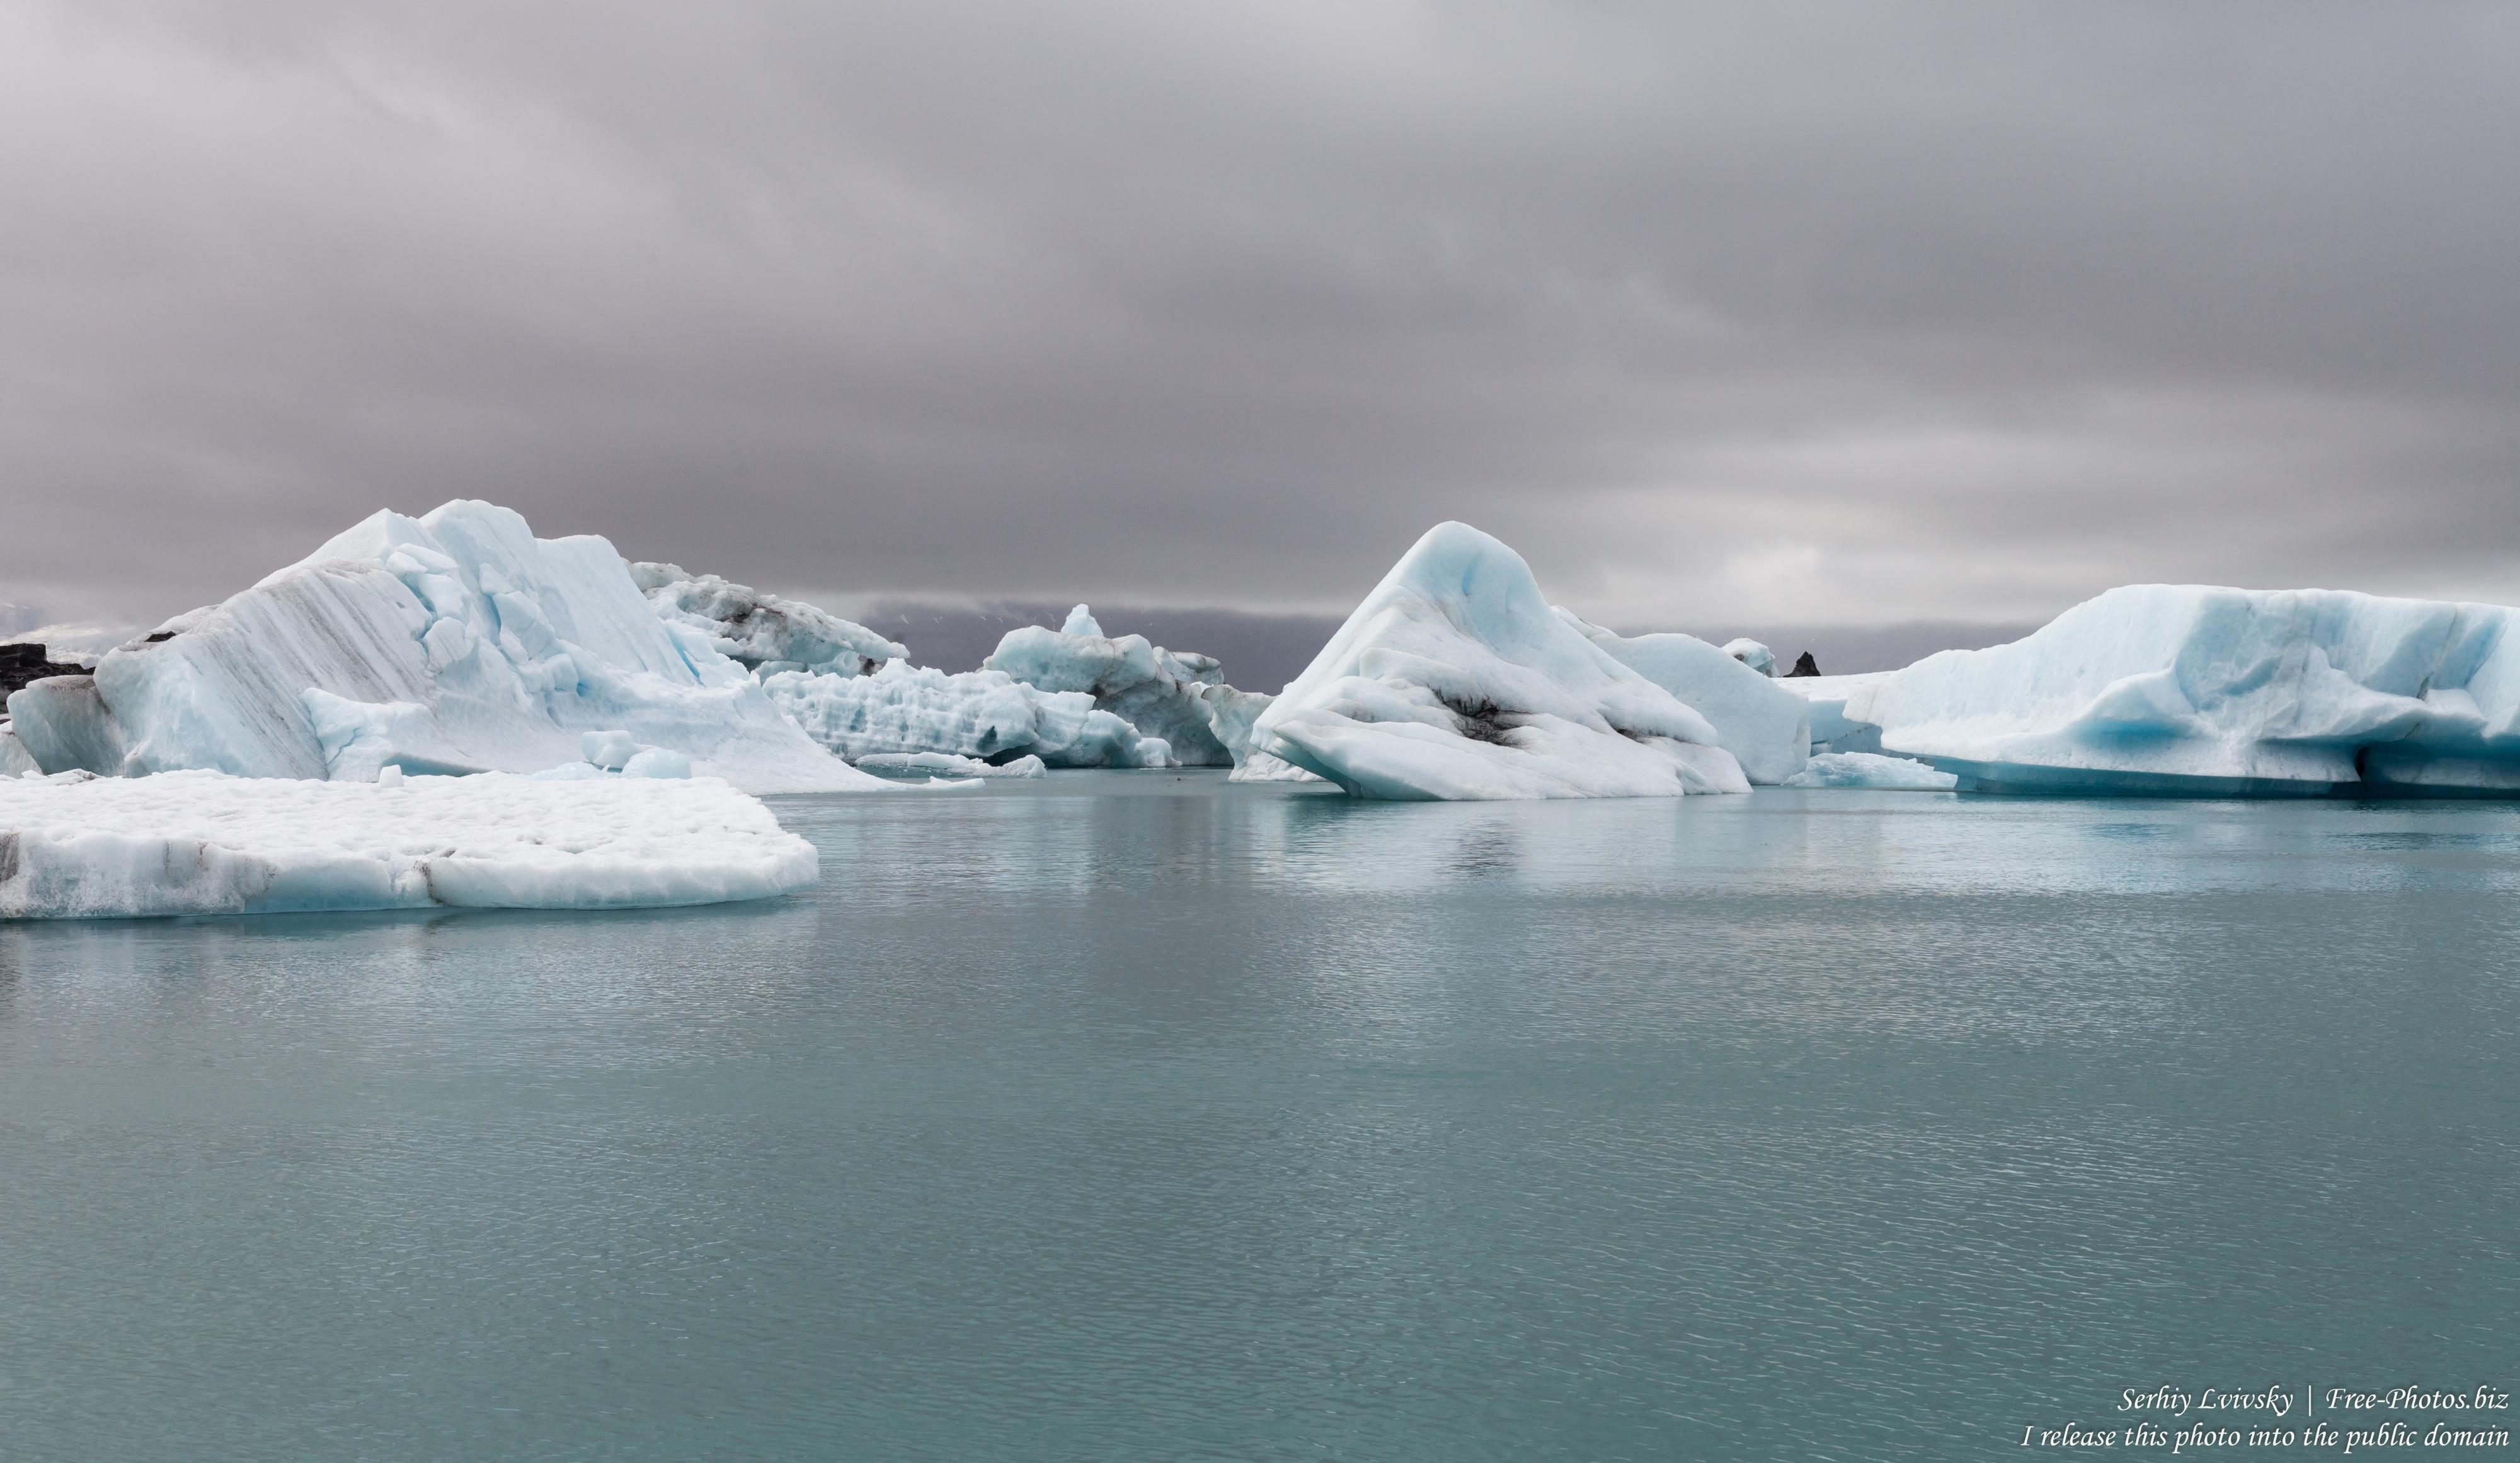 jokulsarlon_glacier_lagoon_iceland_in_may_2019_photographed_by_serhiy_lvivsky_03